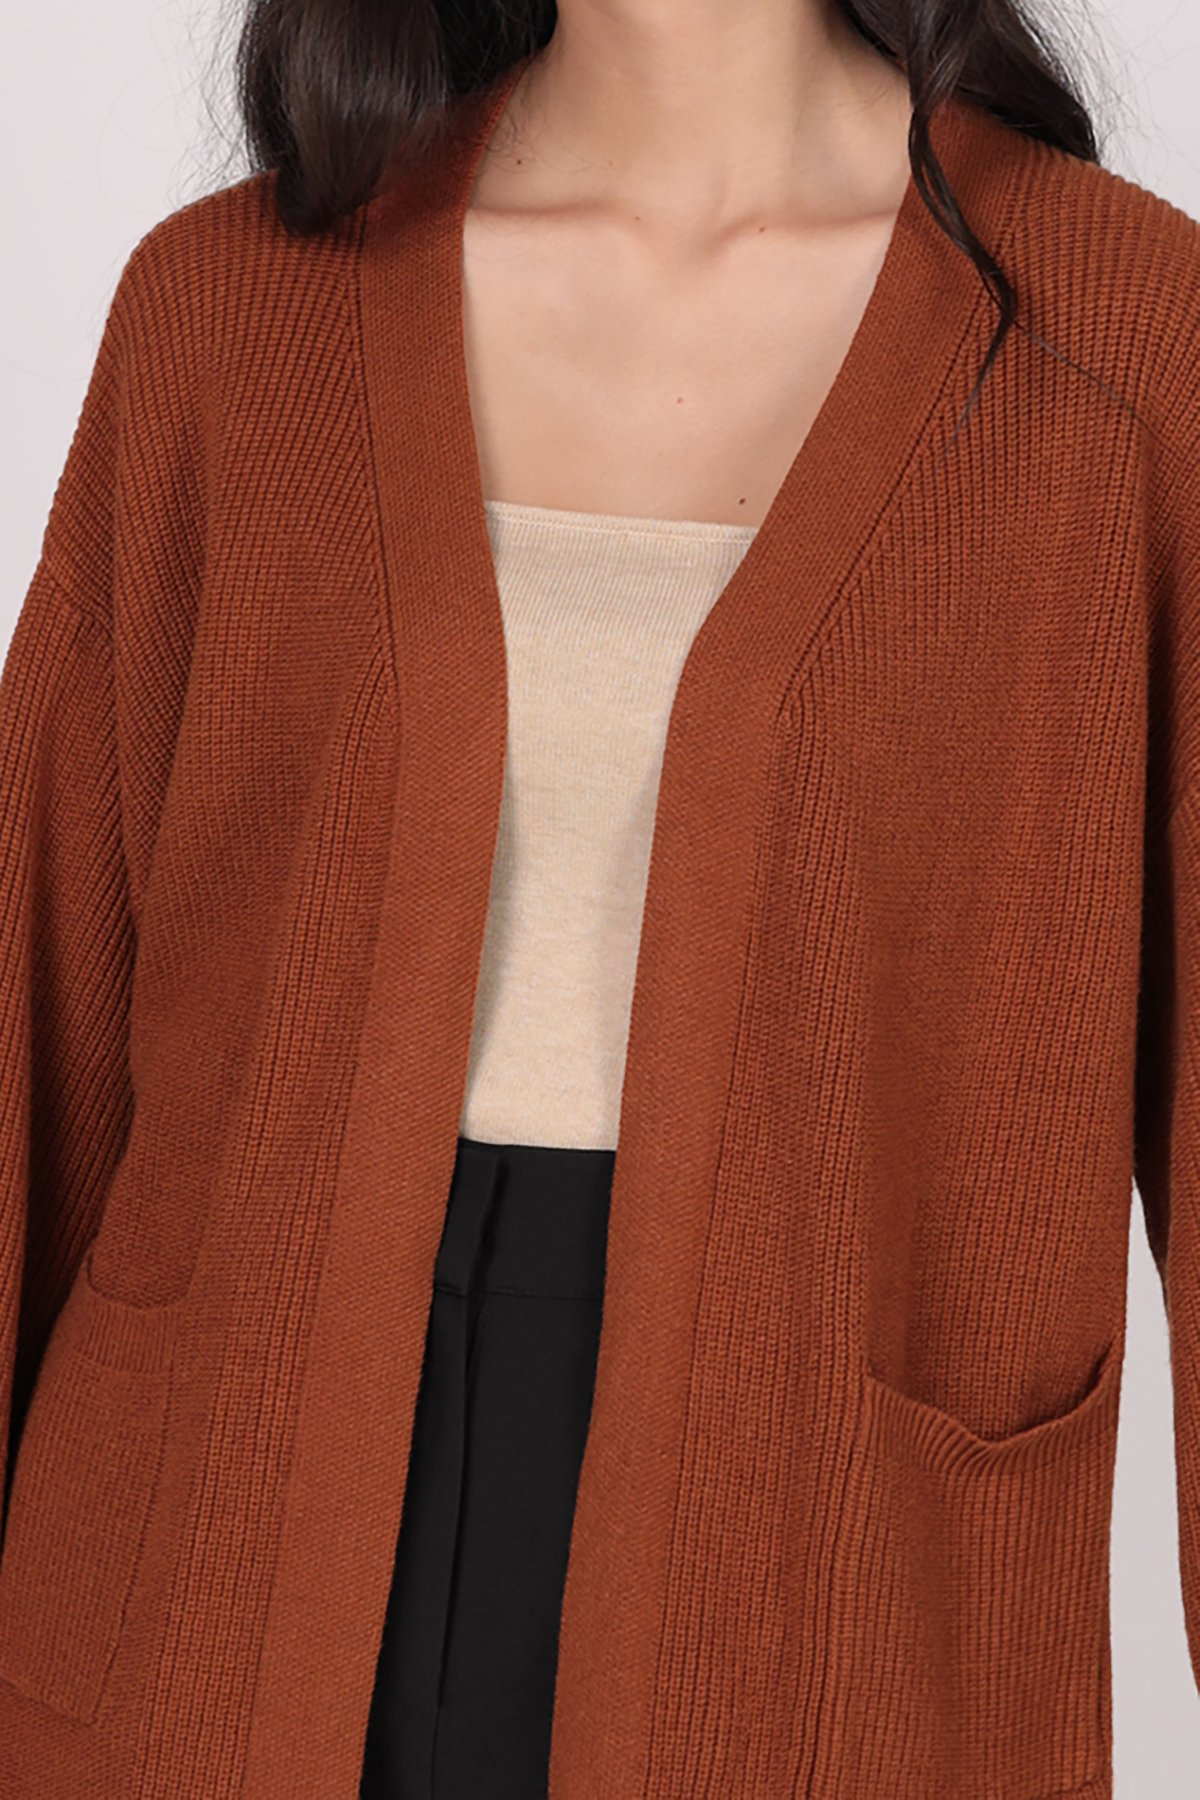 Oscar Knit Cardigan (Caramel)